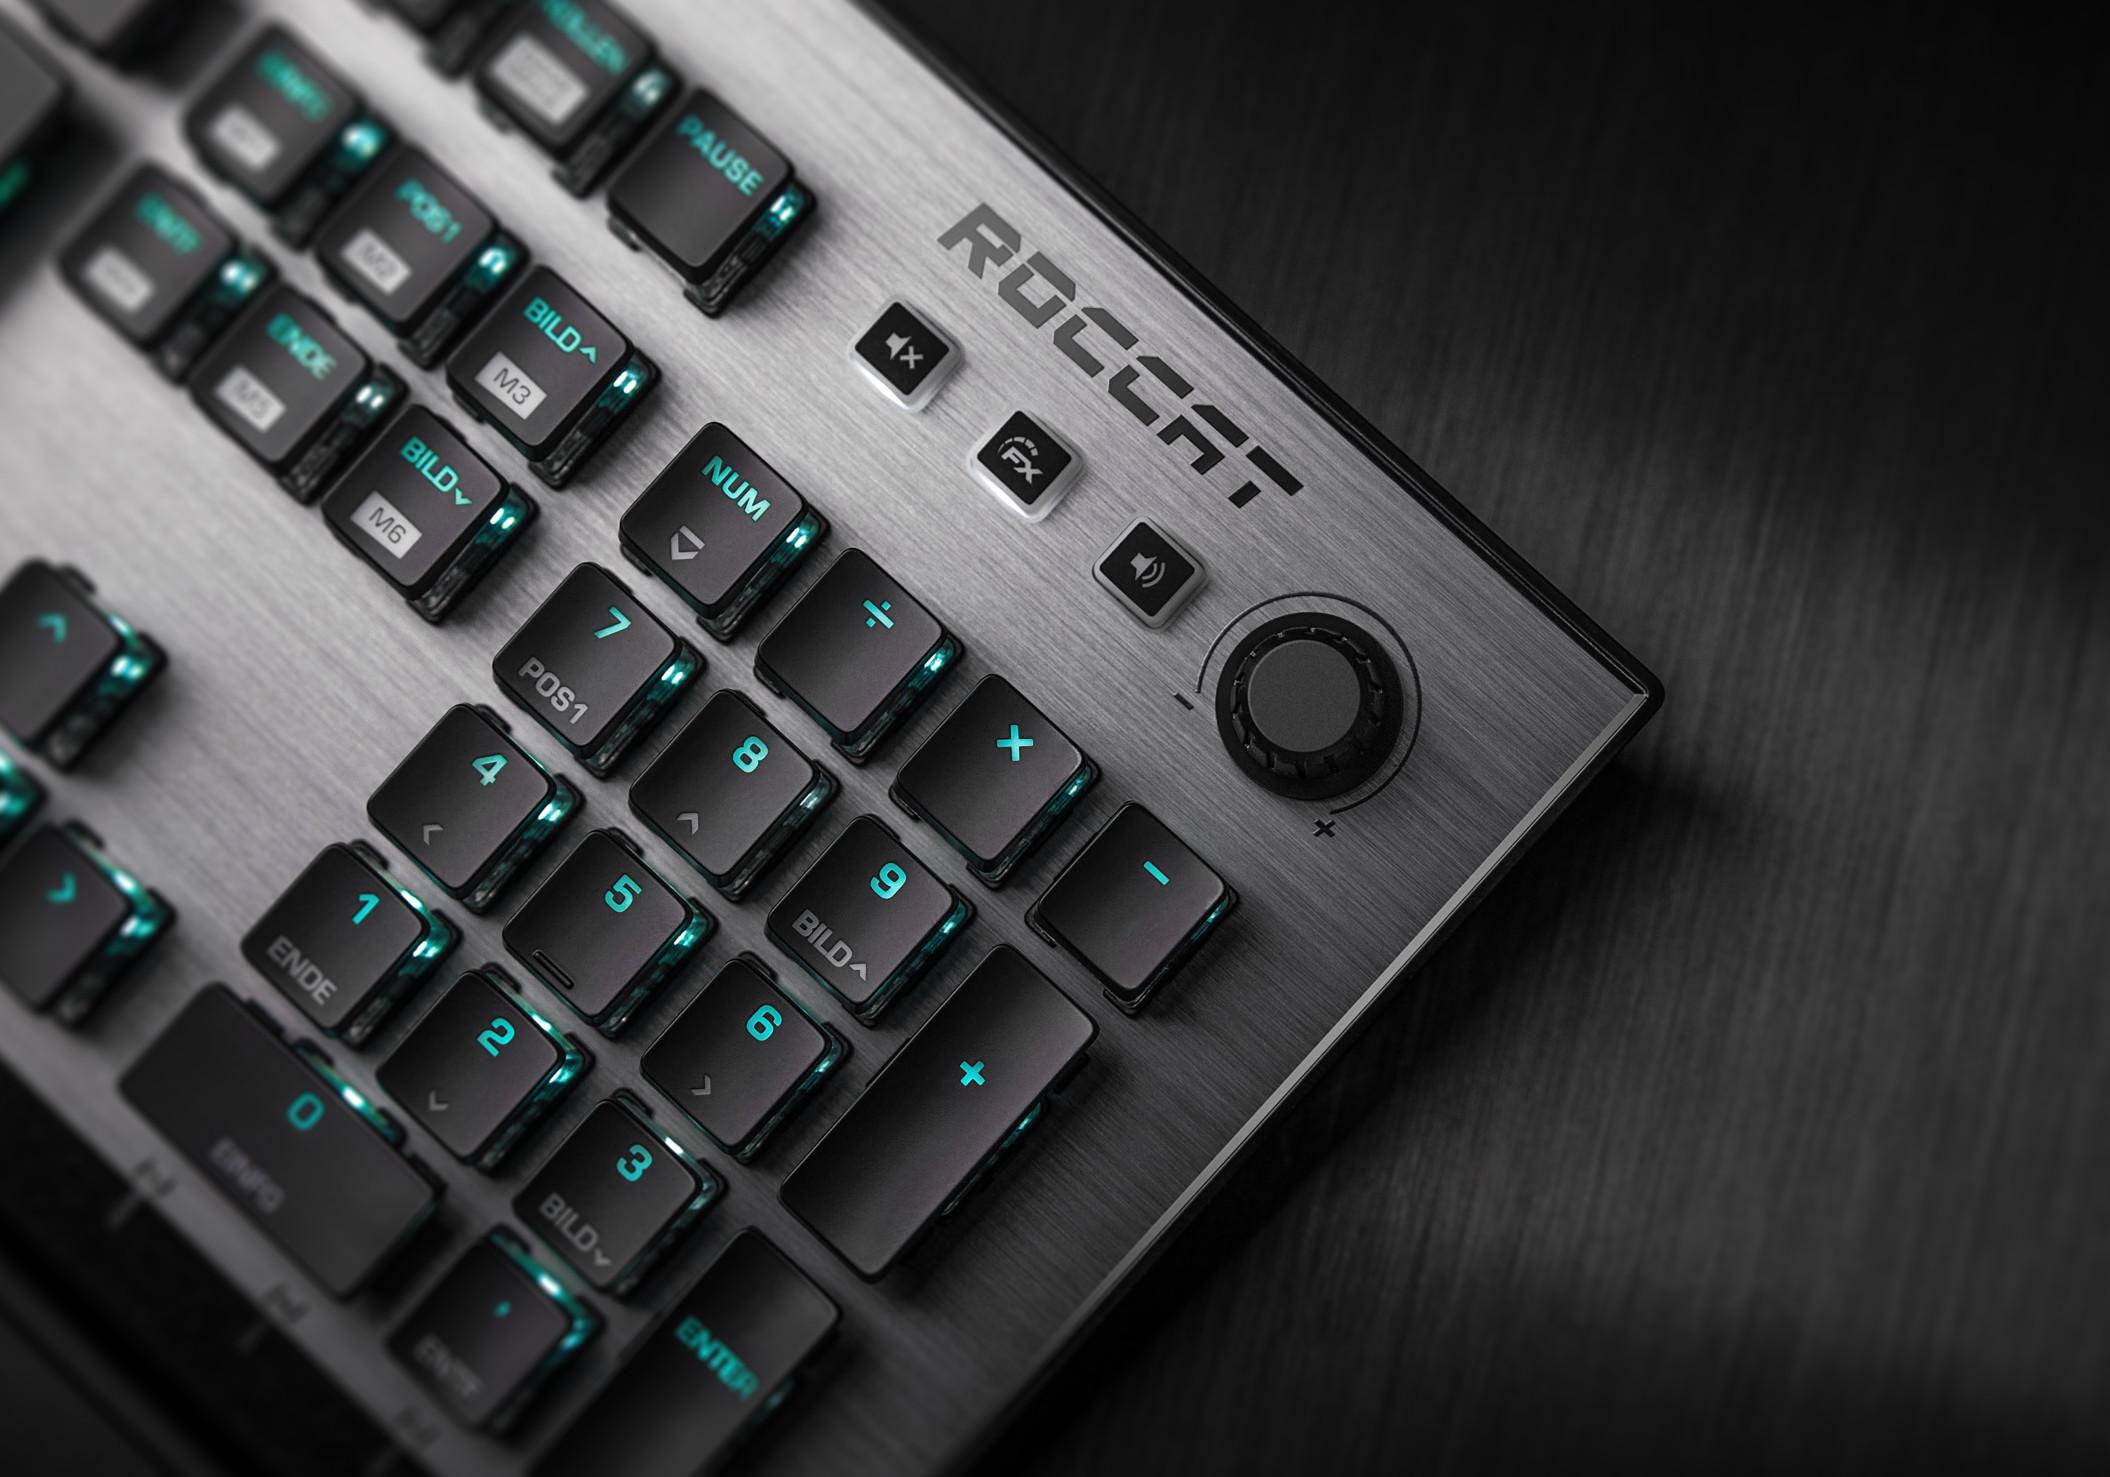 Roccat gaming keyboards